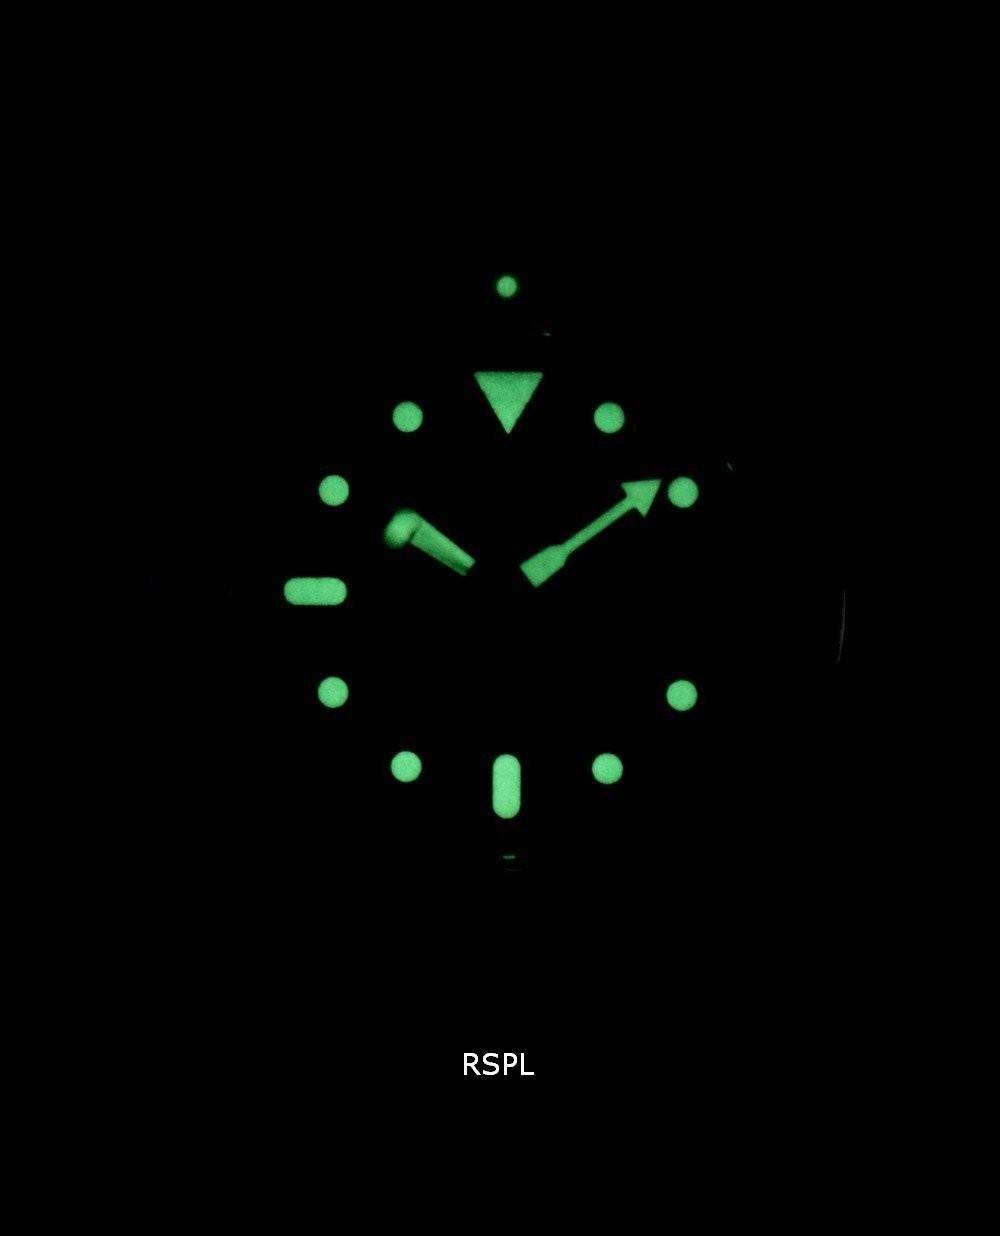 Seiko Automatic Diver's Ratio Dark Brown Leather SKX007J1-LS11 200M Men's Watch